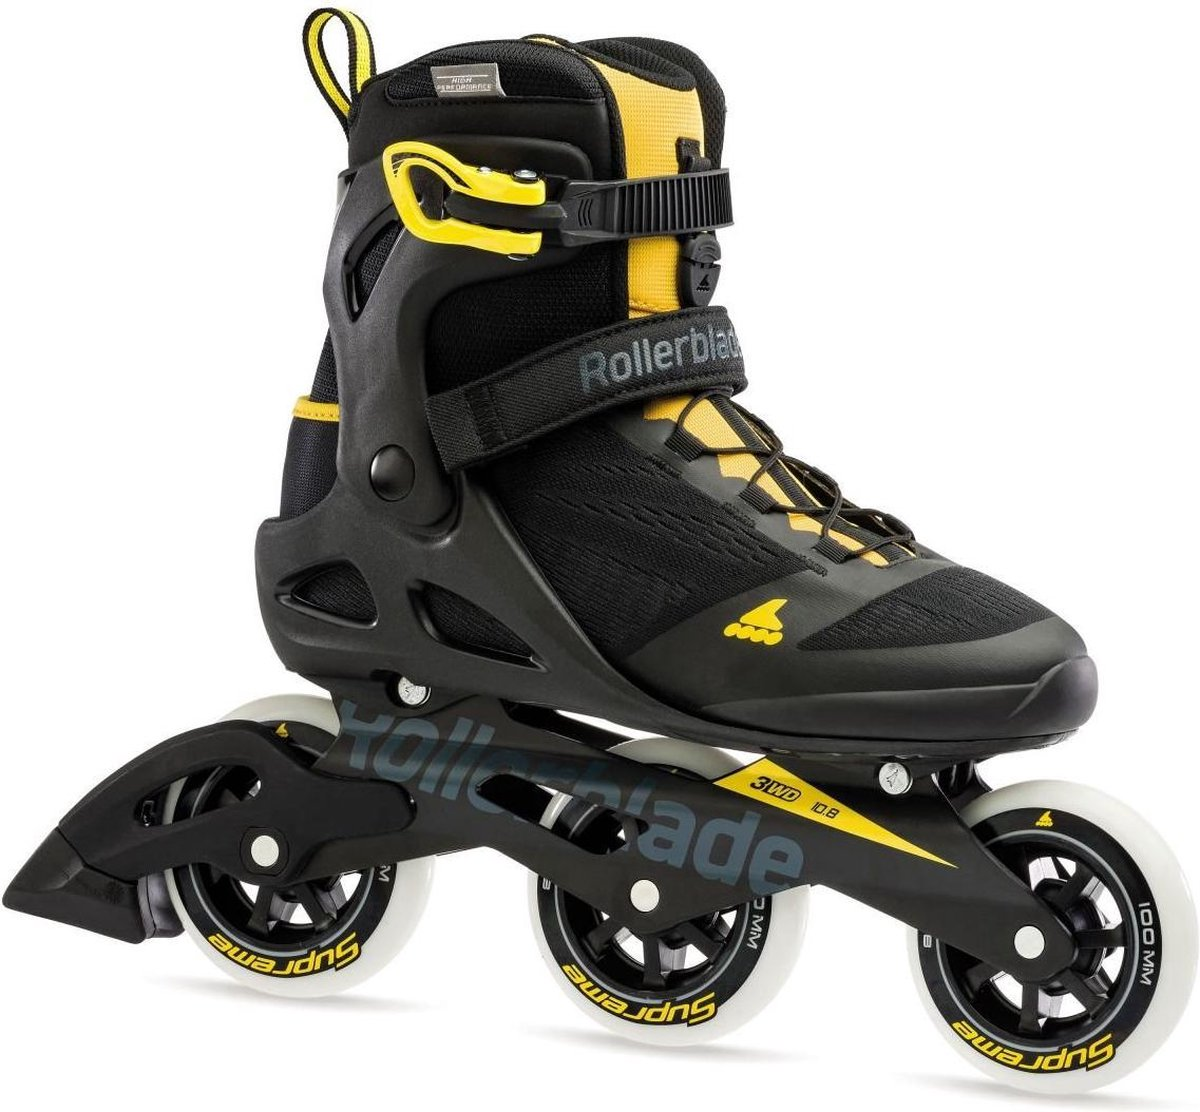 Rollerblade Macroblade 3WD inline skates 100 mm black / saffron yellow